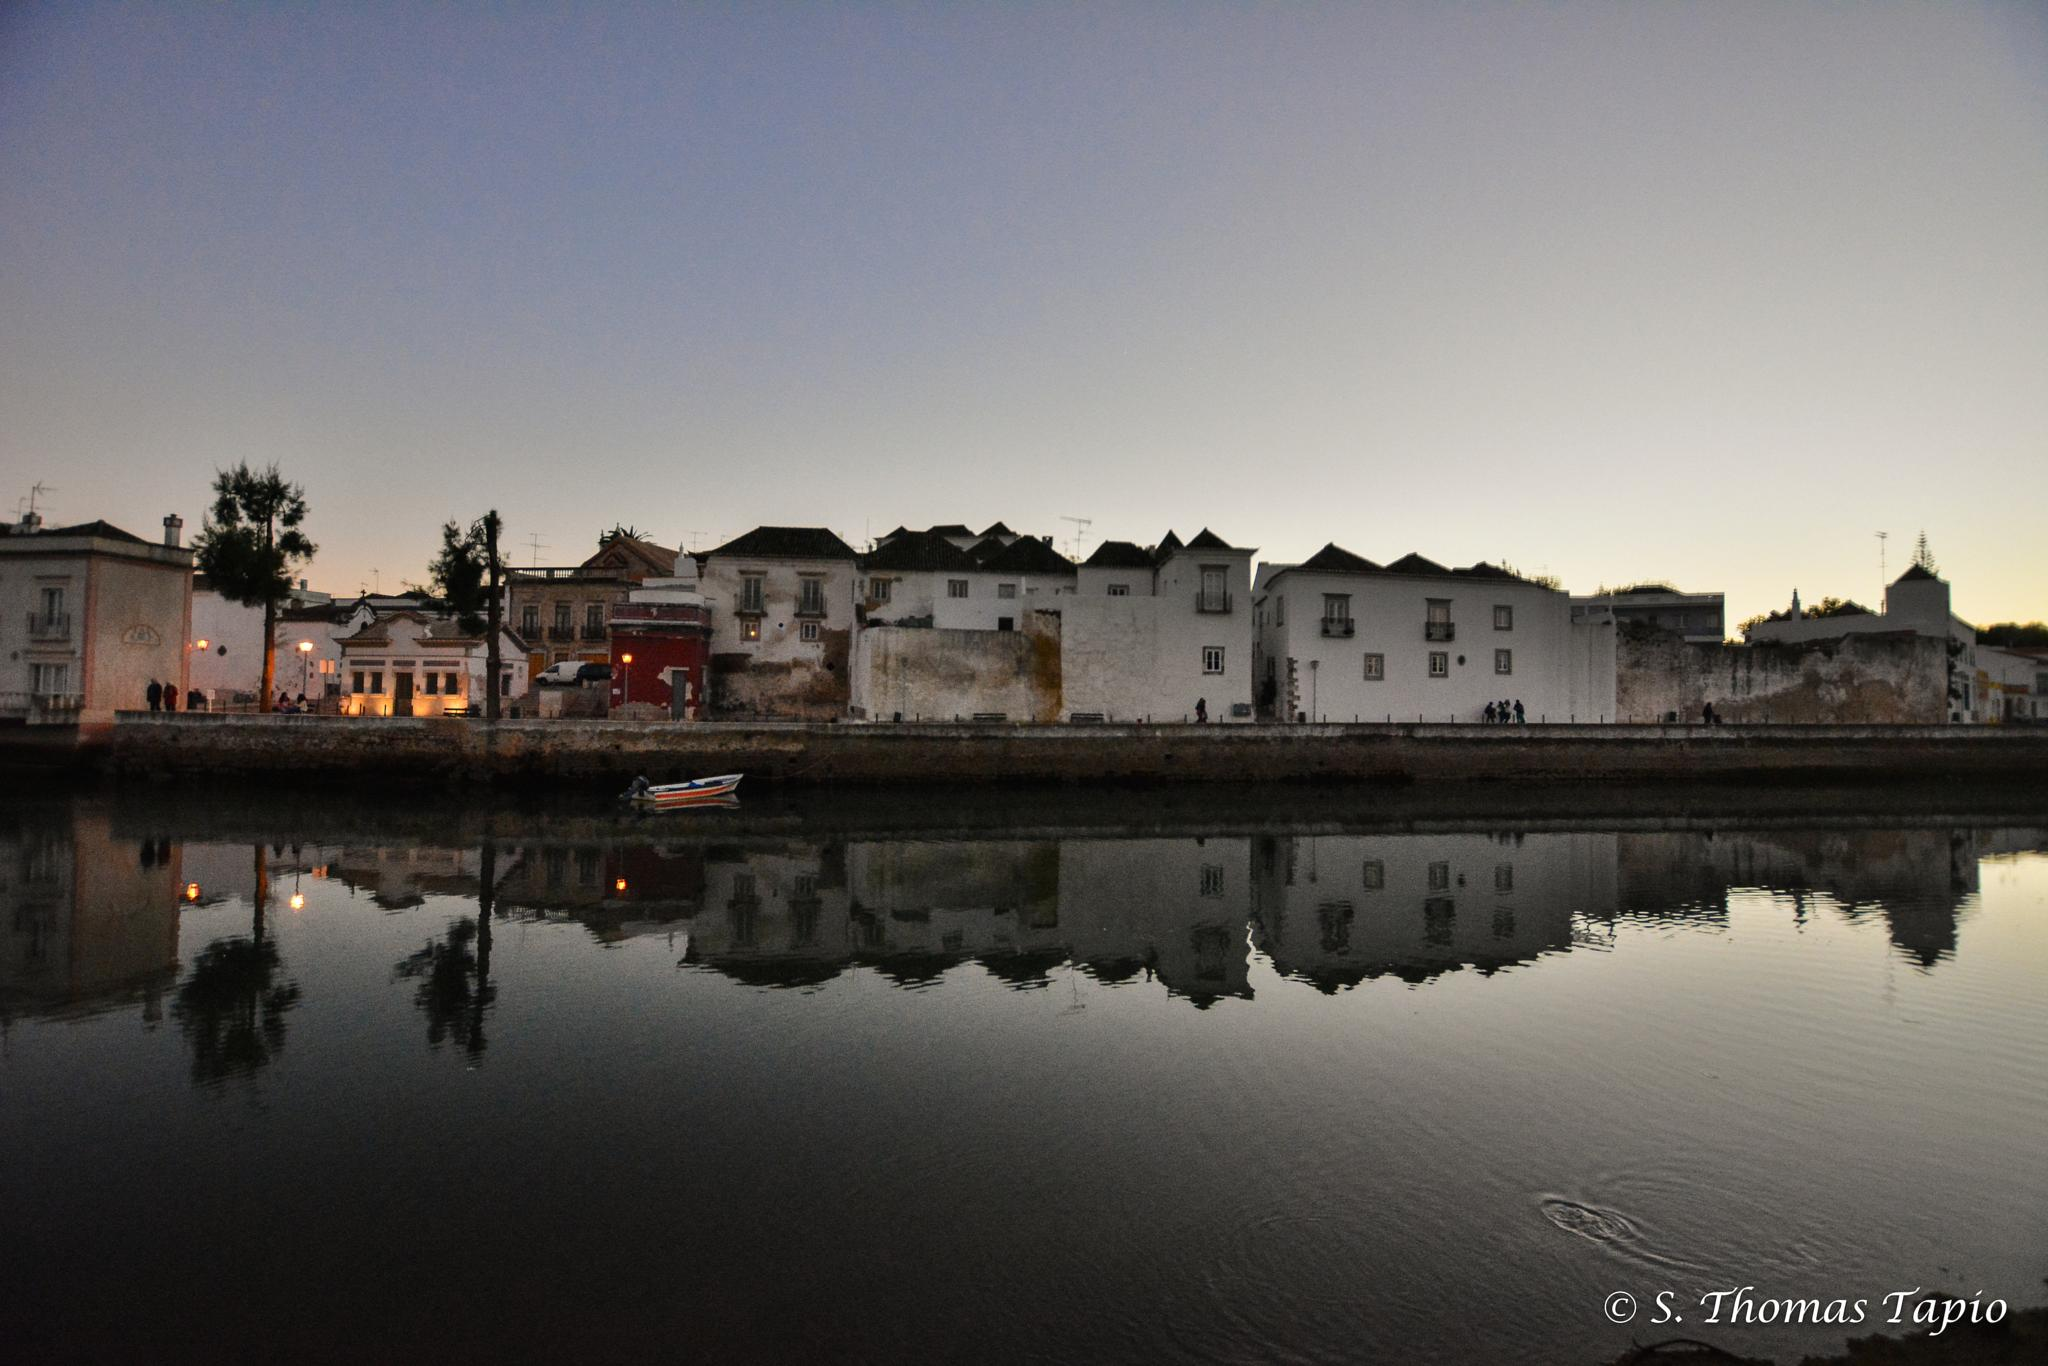 Twilight in Tavira, Portugal by Thomas Tapio